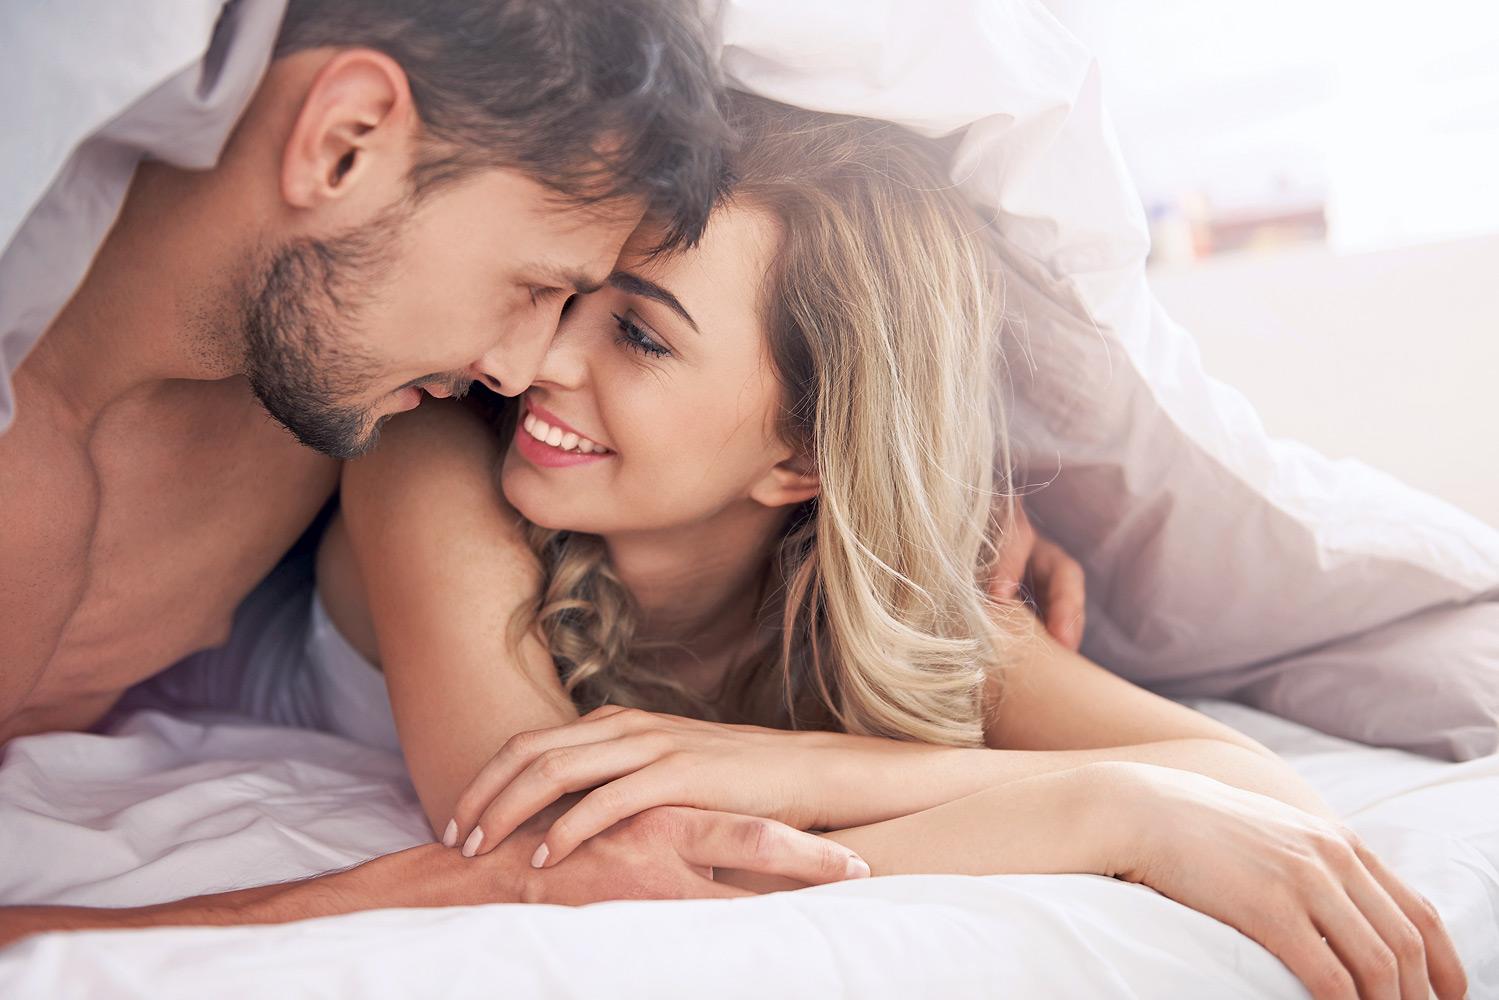 Онлайн секс во время родов